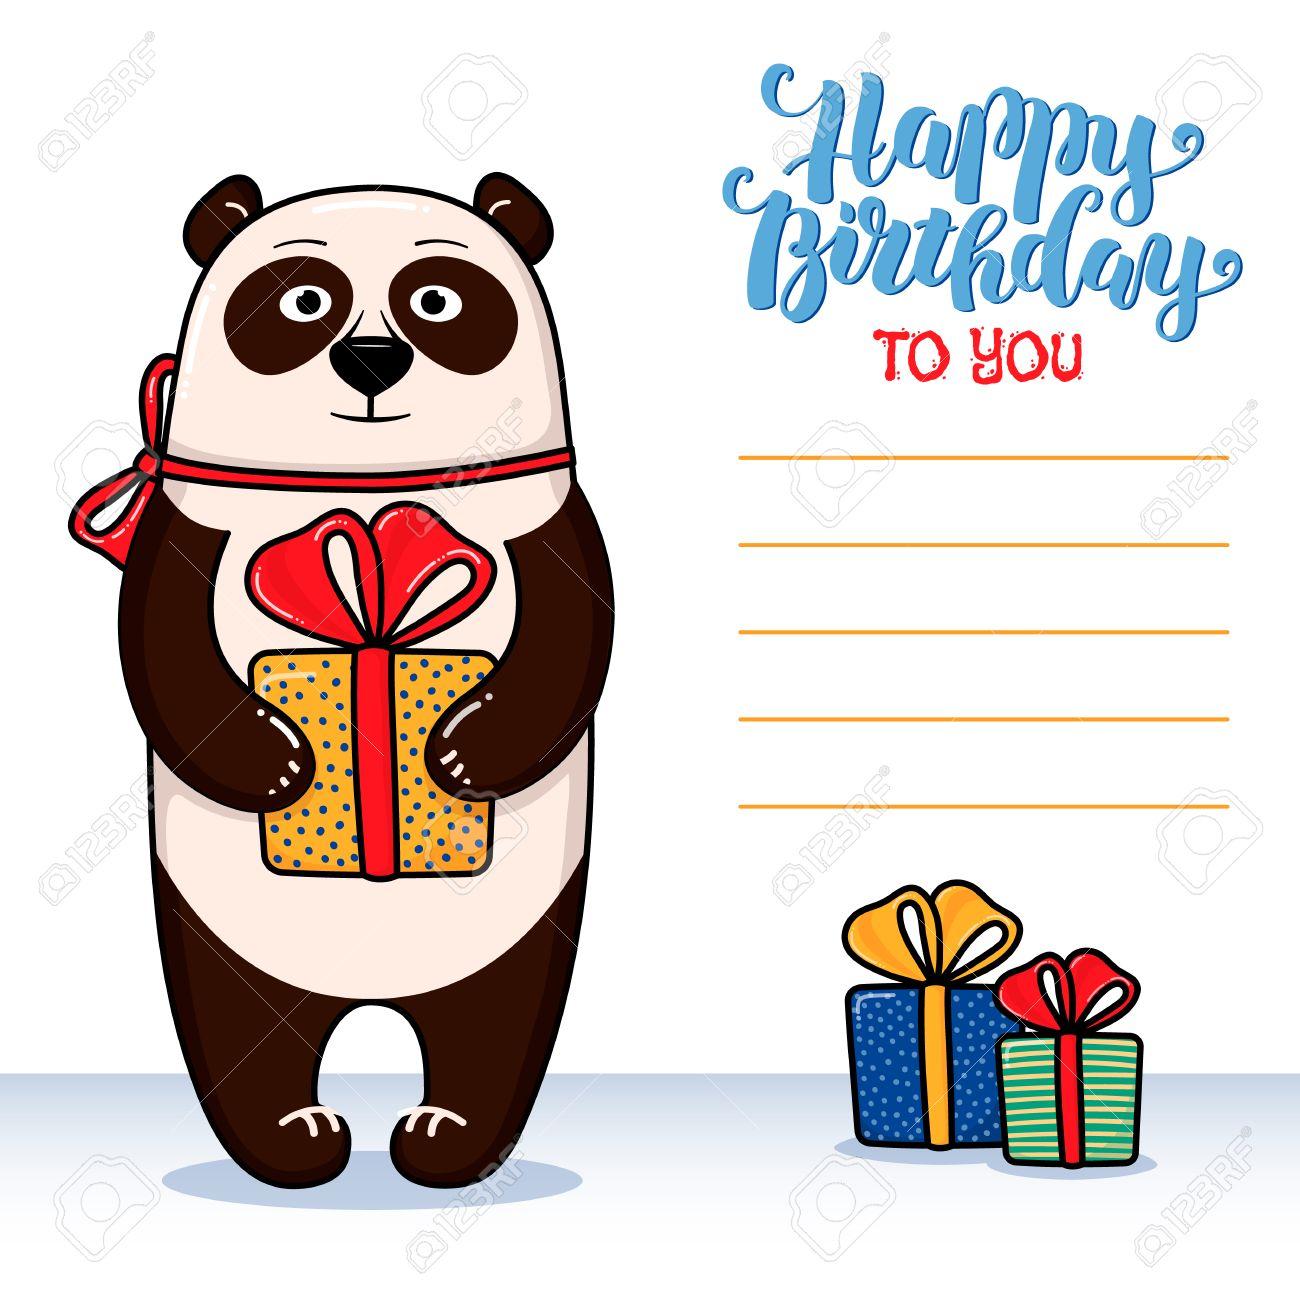 Happy birthday greeting card with panda holding gift lettering and happy birthday greeting card with panda holding gift lettering and lines for congratulations and signature bookmarktalkfo Choice Image